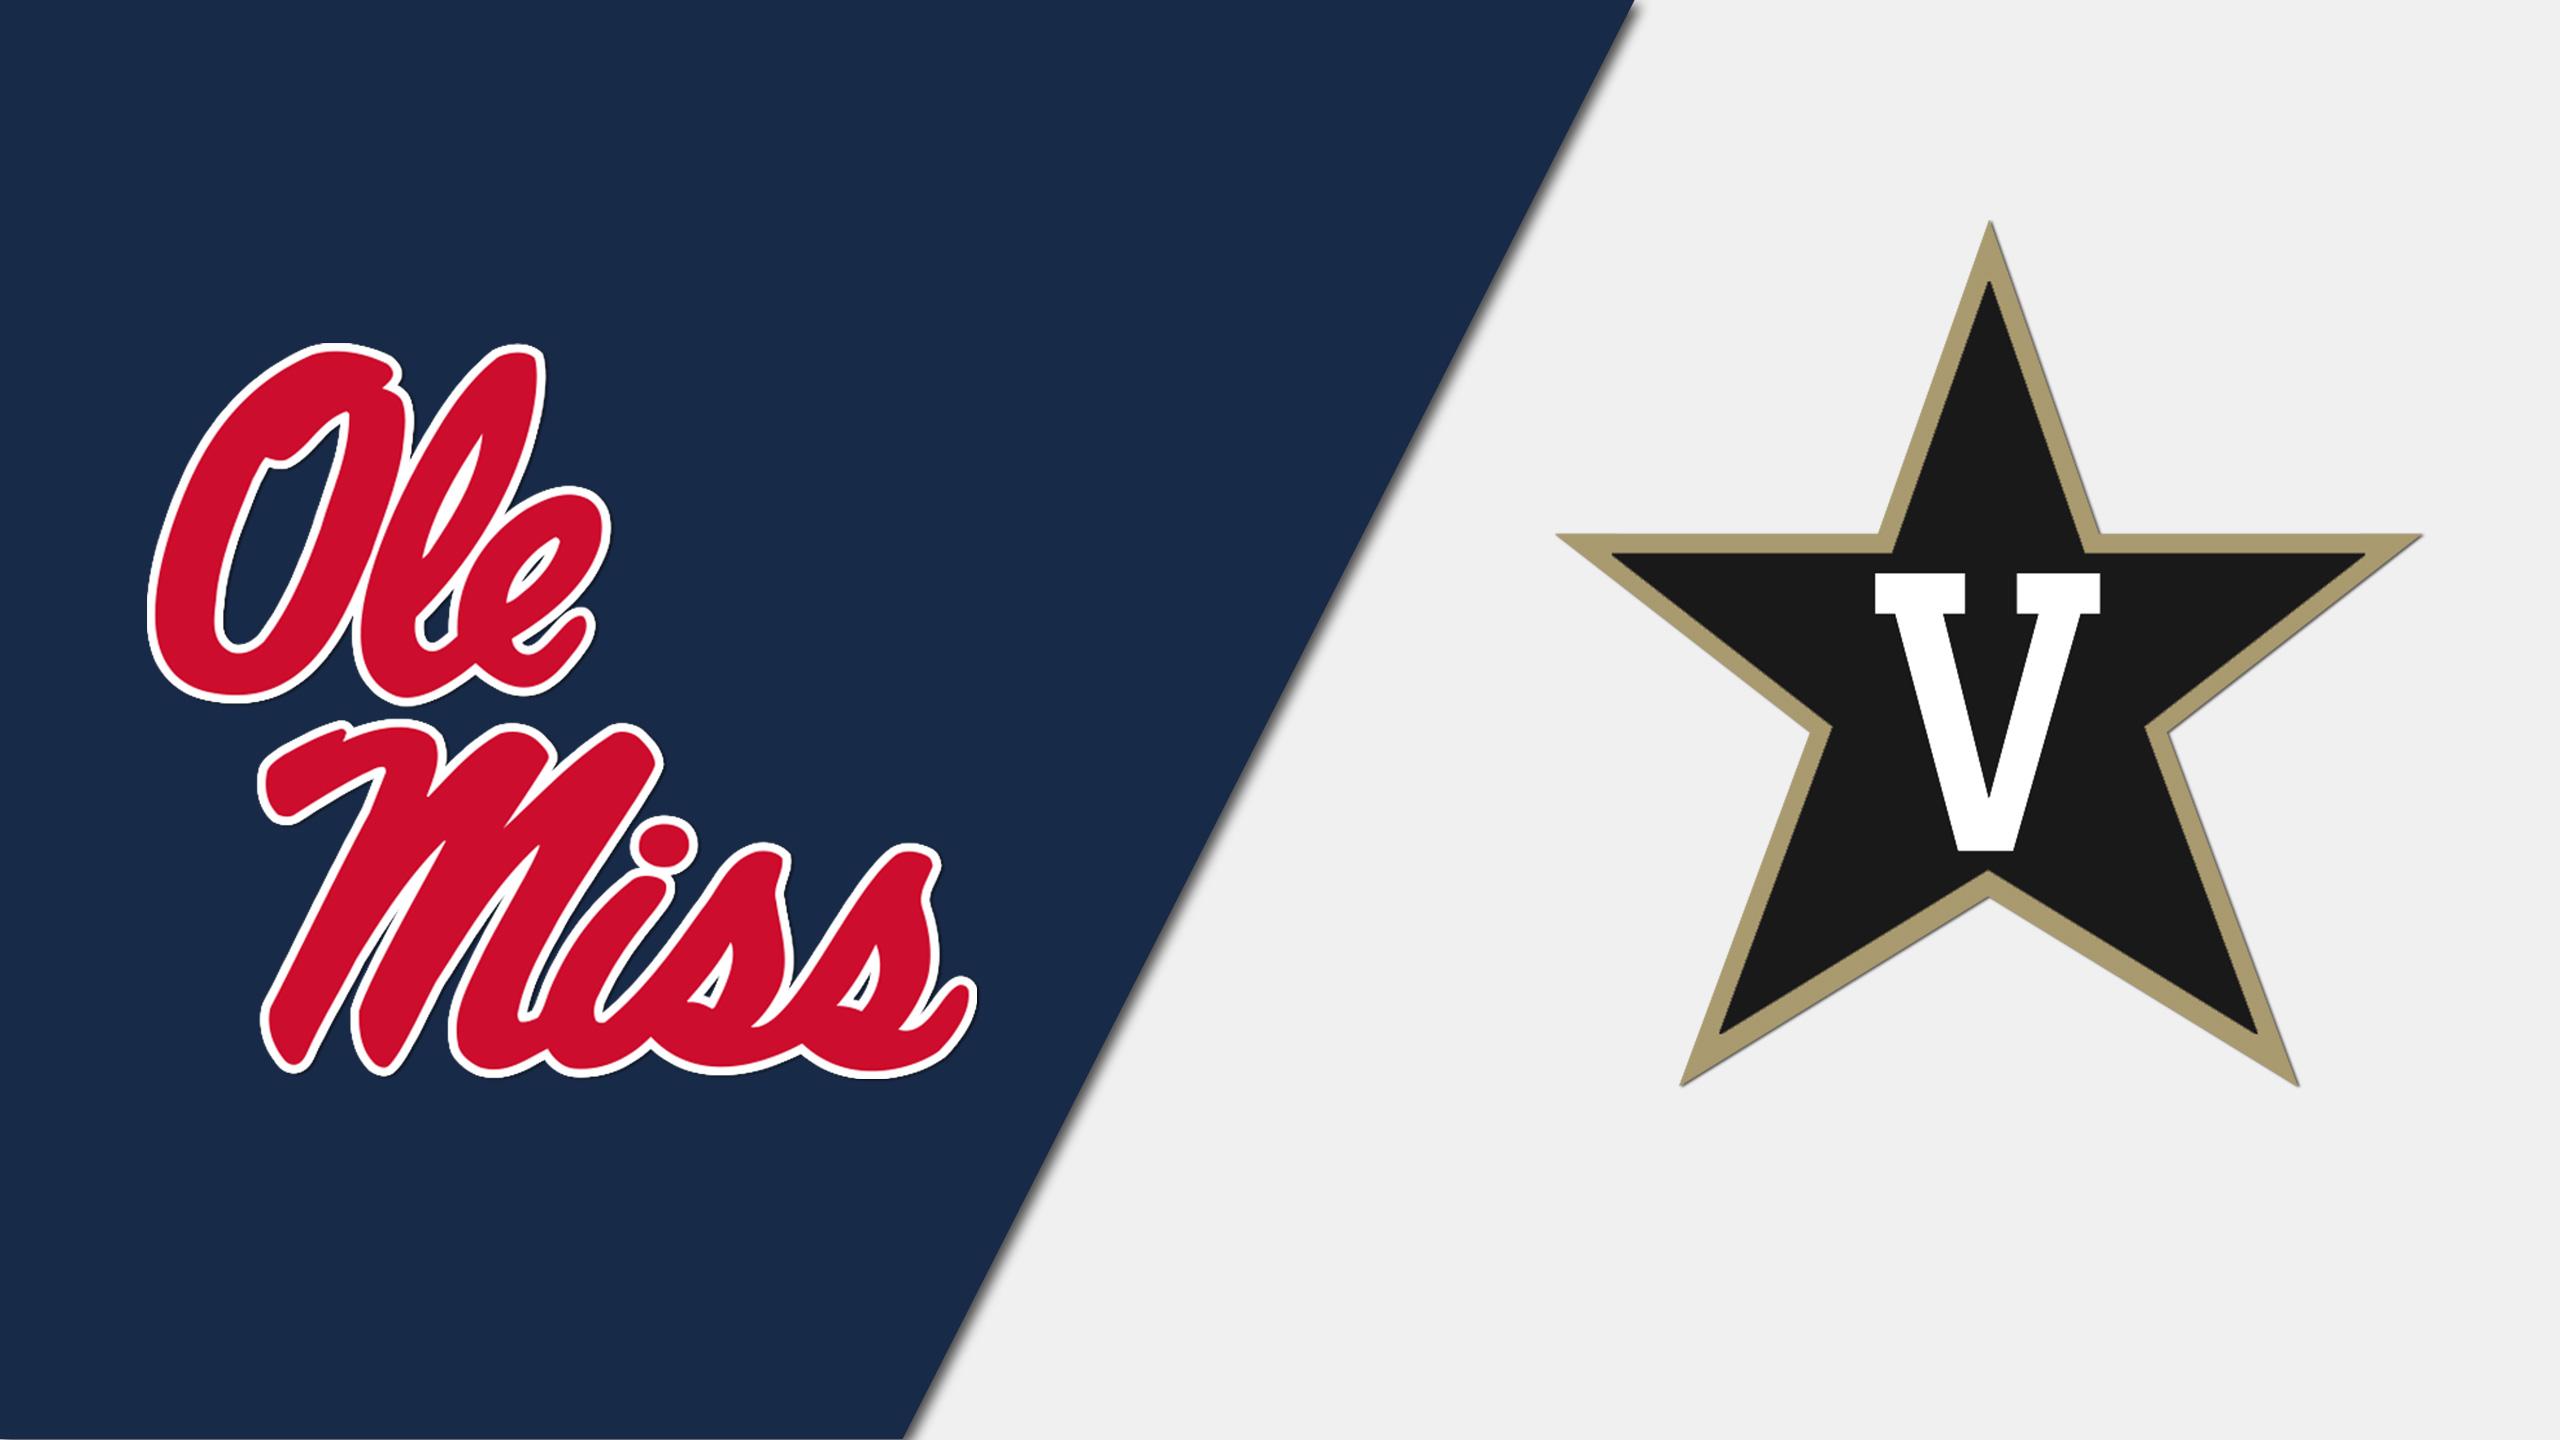 Ole Miss vs. Vanderbilt (Championship)